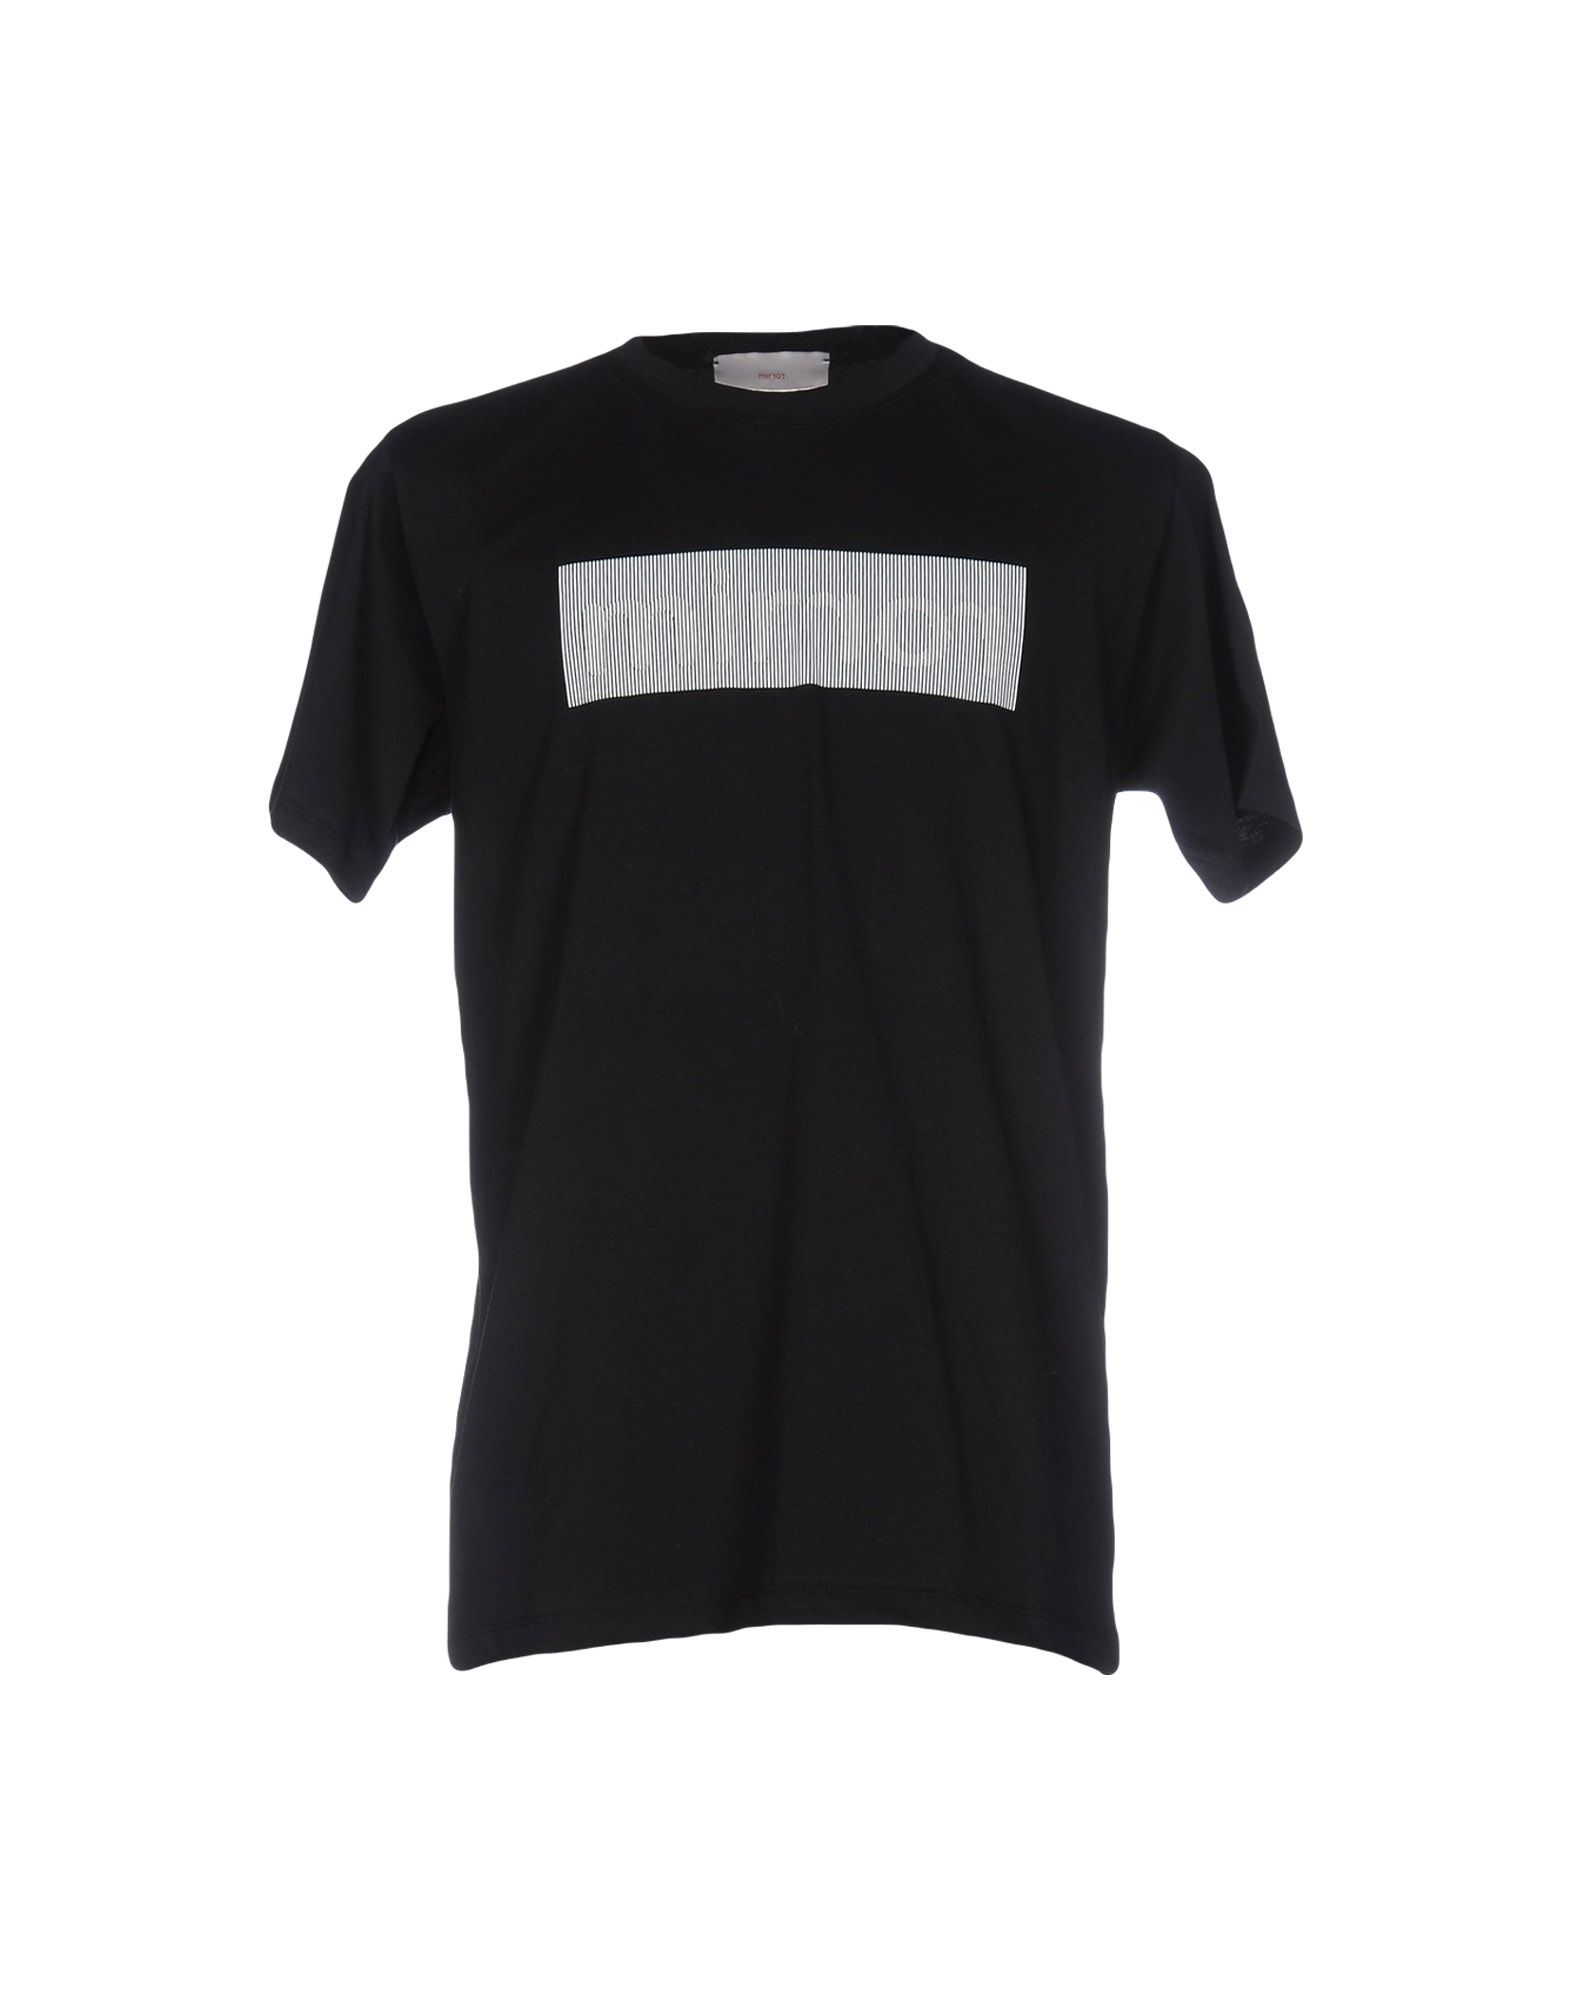 'MIRROR T-shirts